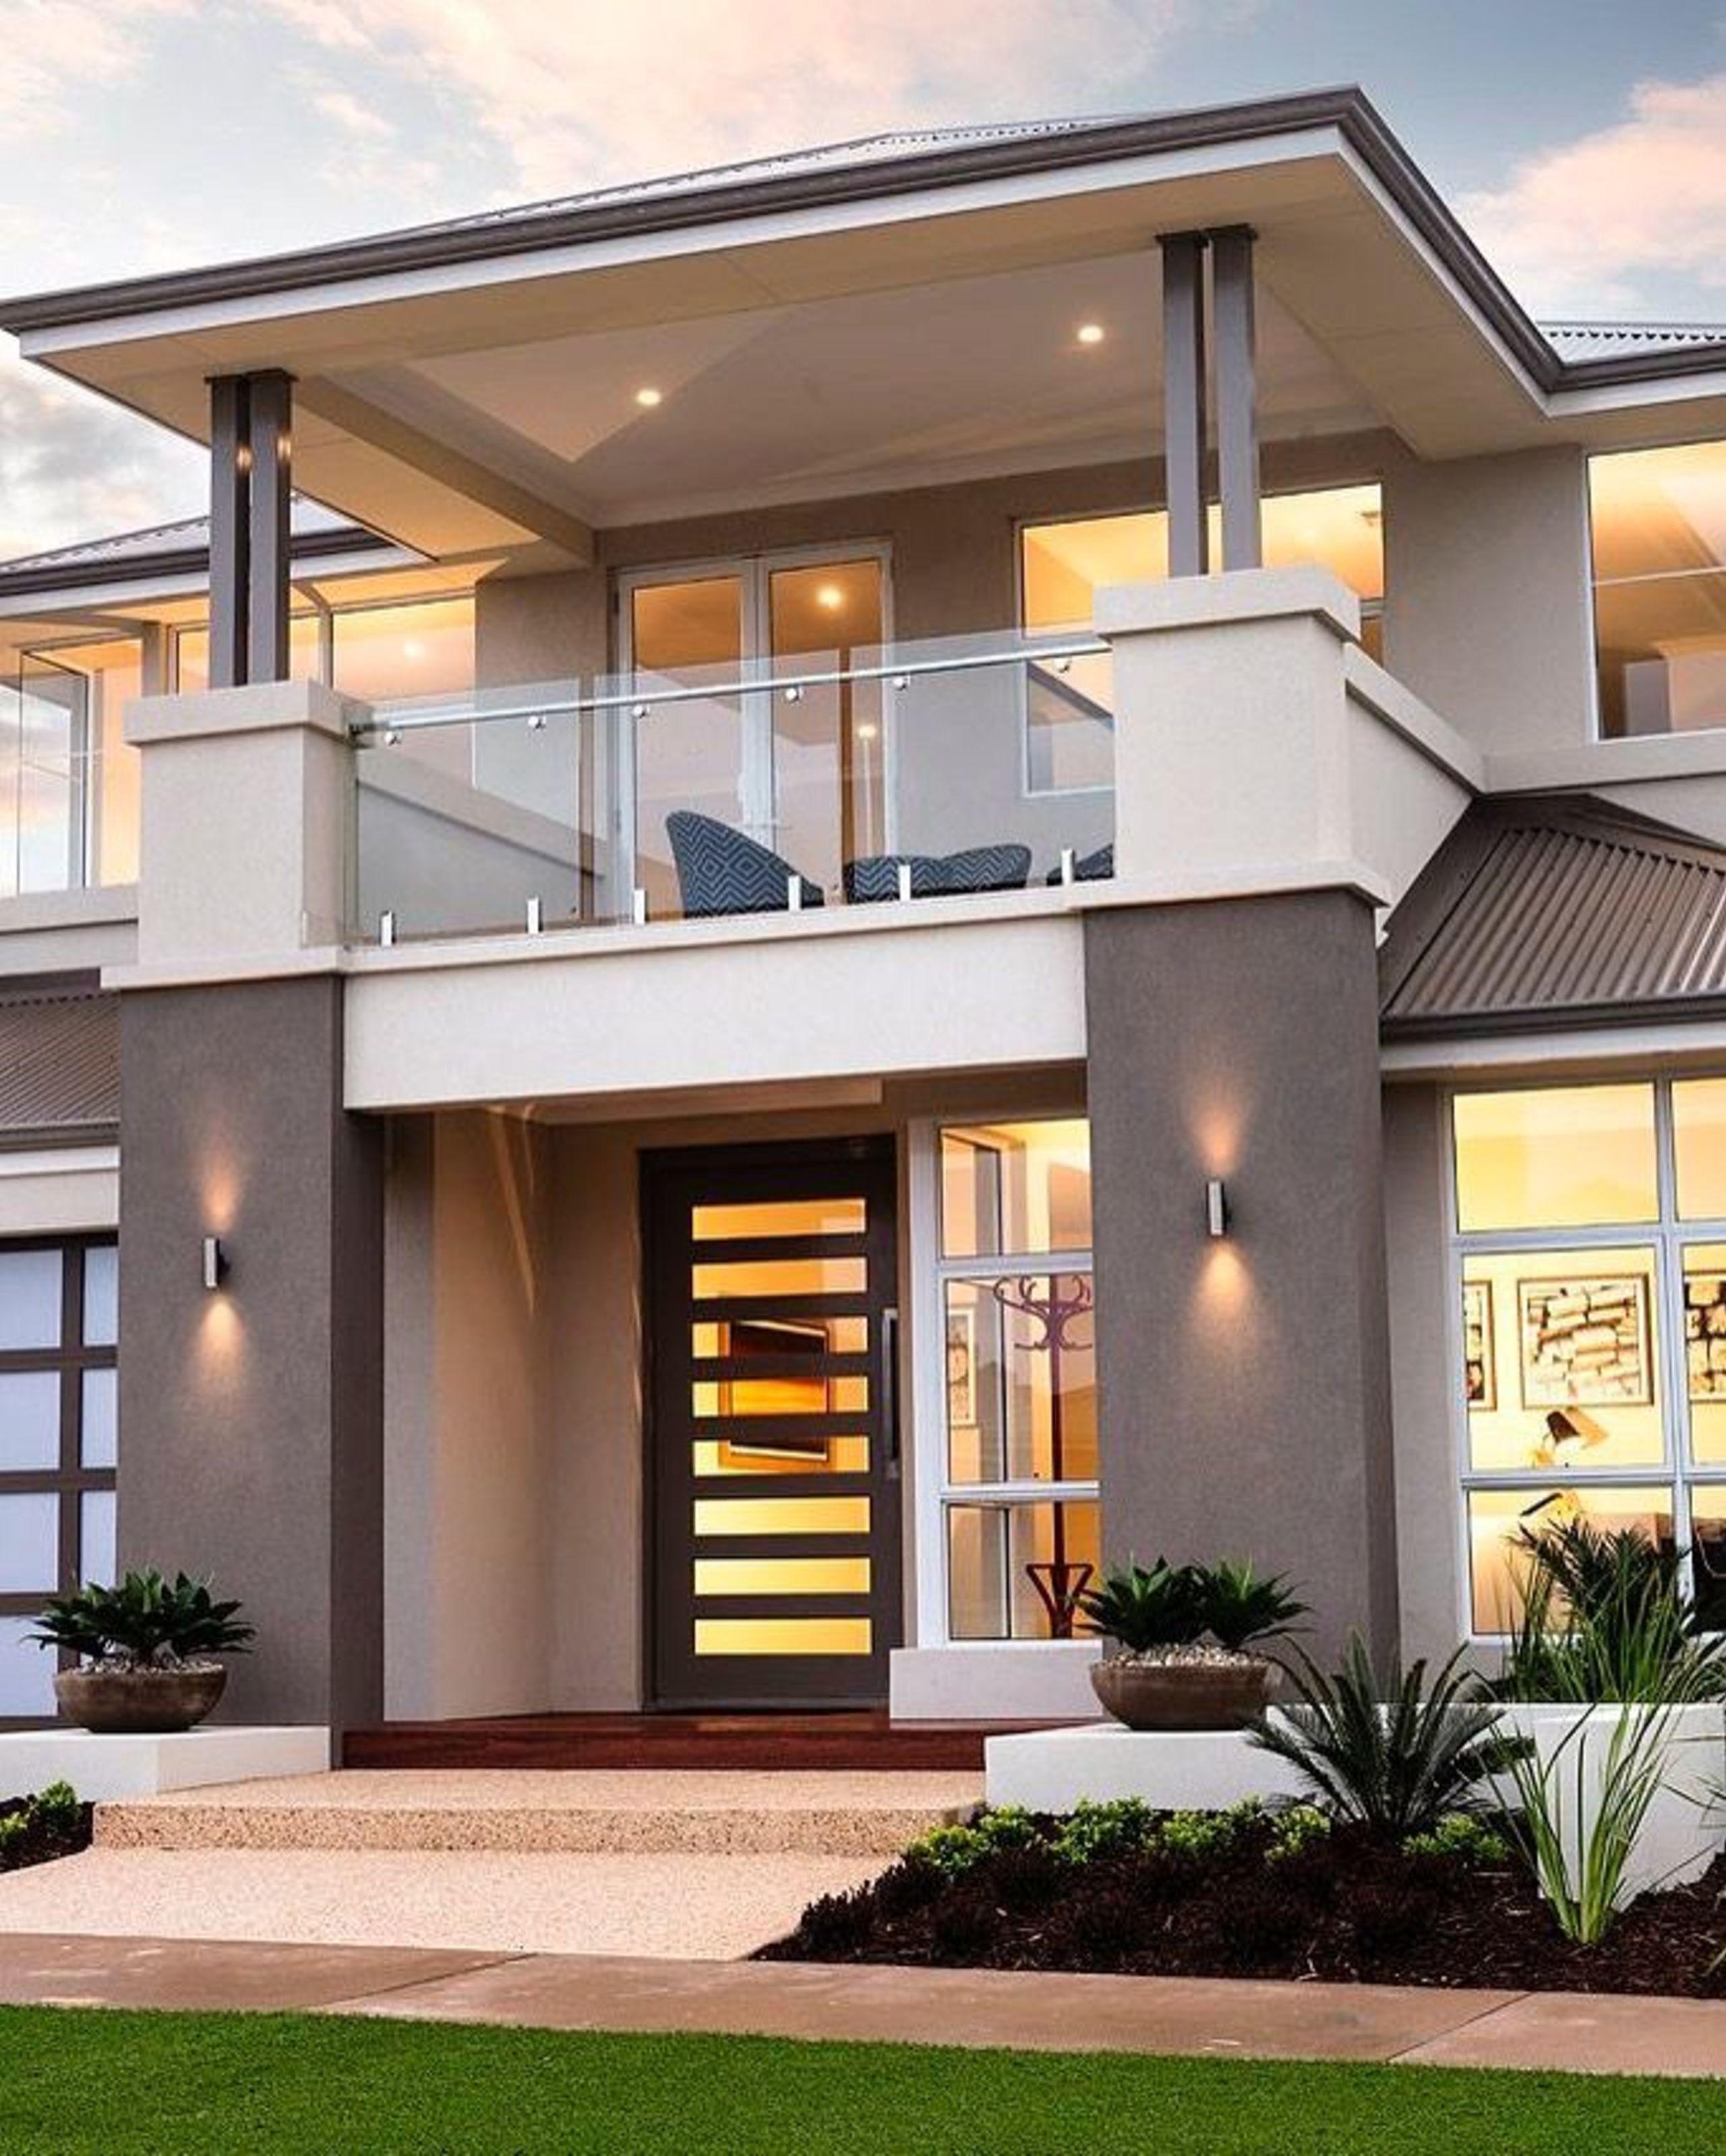 Revel in stunning suburban landscapes